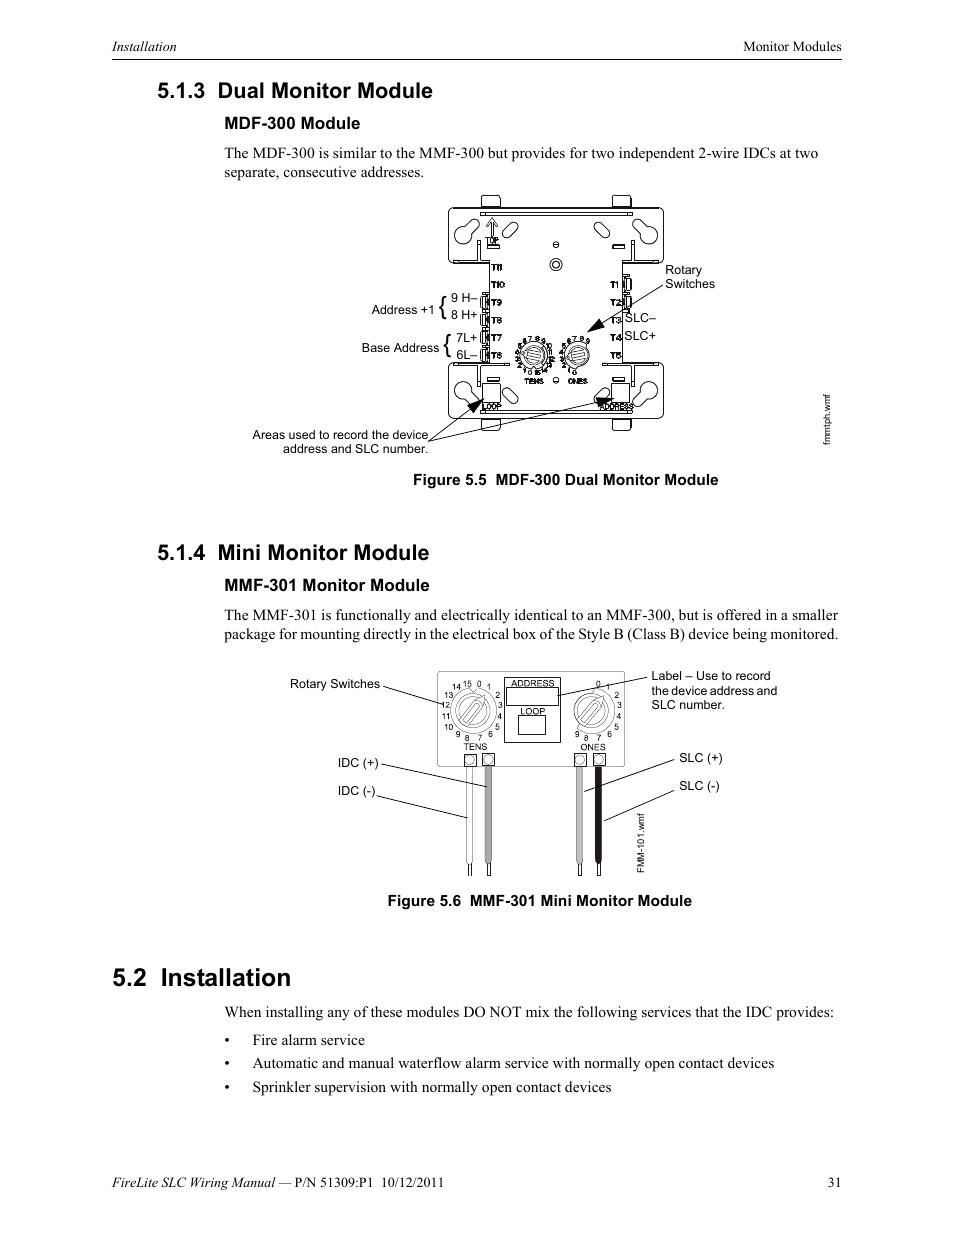 3 dual monitor module, Mdf-300 module, 4 mini monitor module | Fire-Lite  SLC Intelligent Control Panel Wiring Manual User Manual | Page 31 / 80